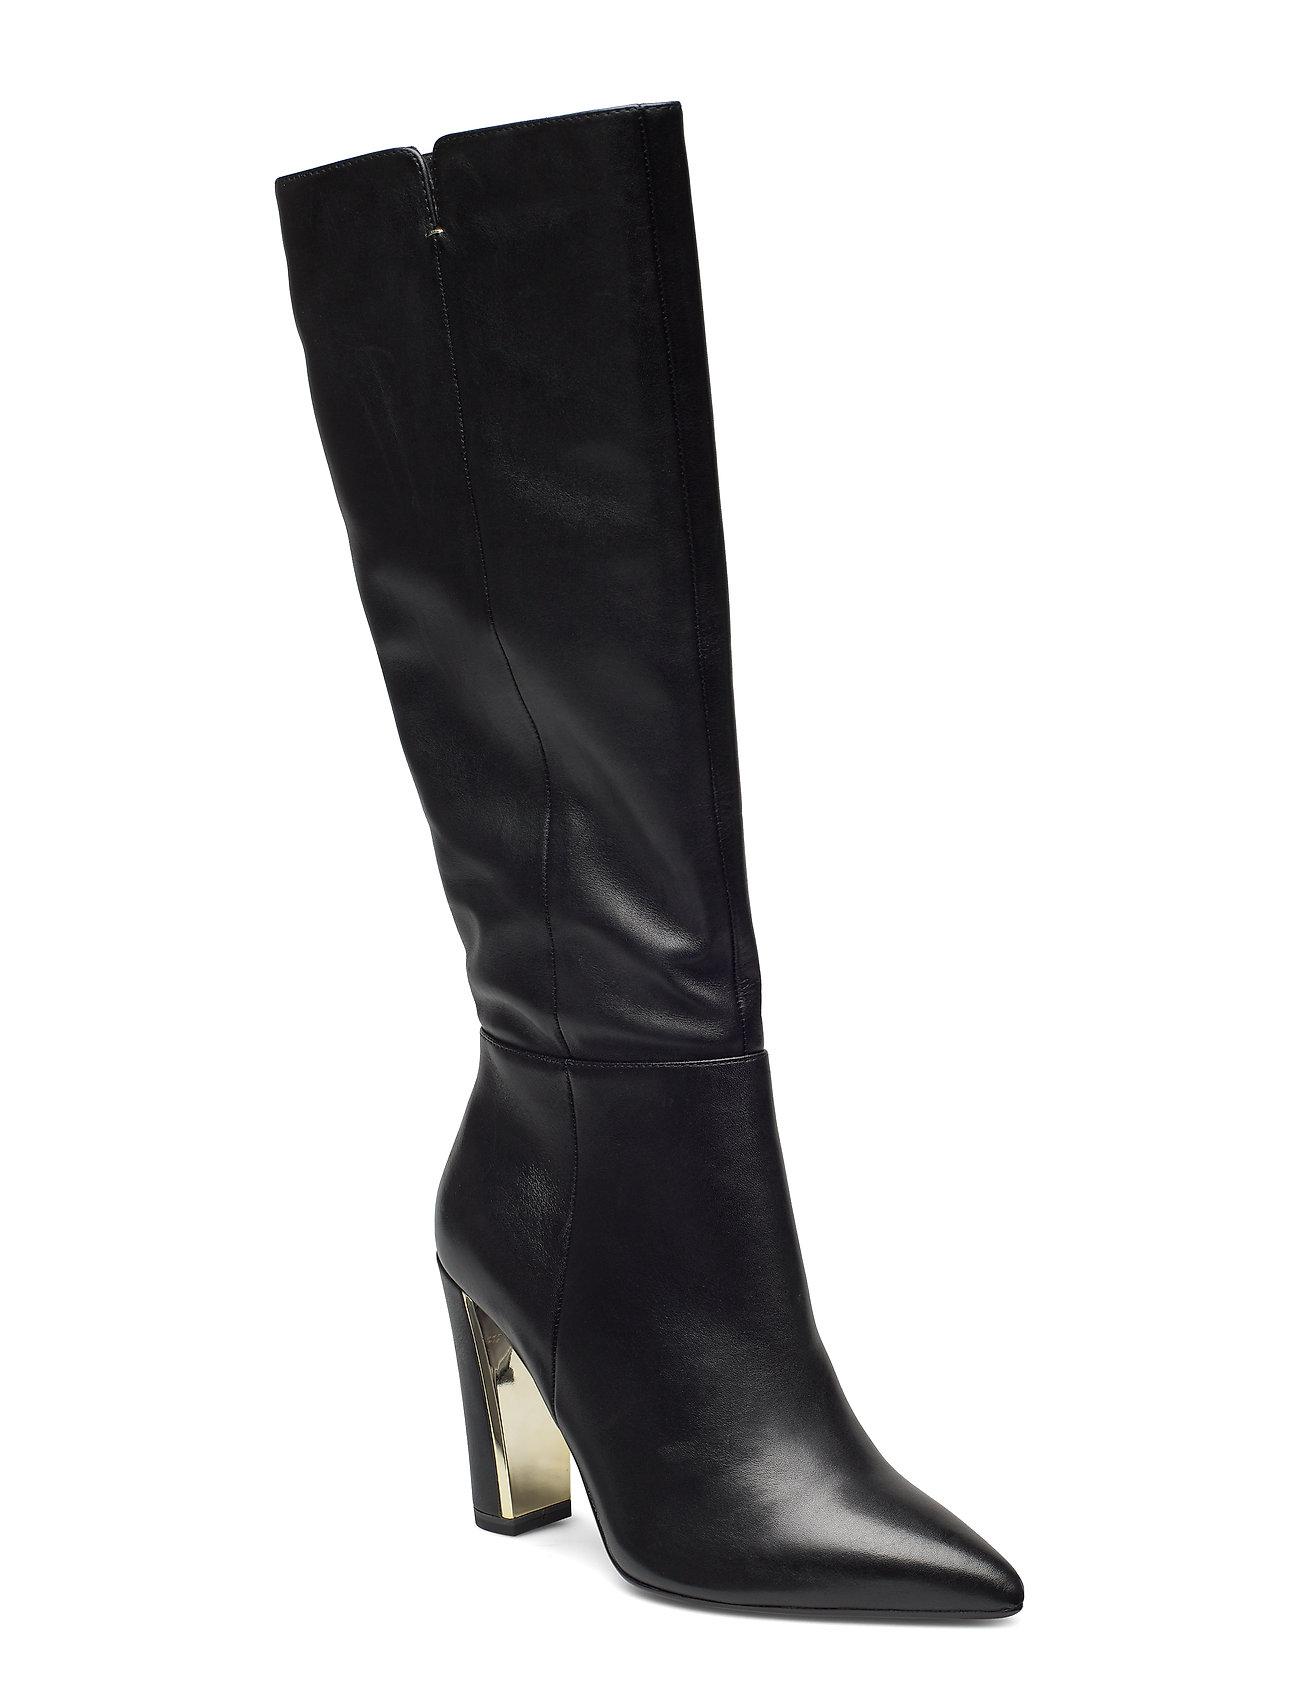 Tamaris Heart & Sole Woms Boots - BLACK